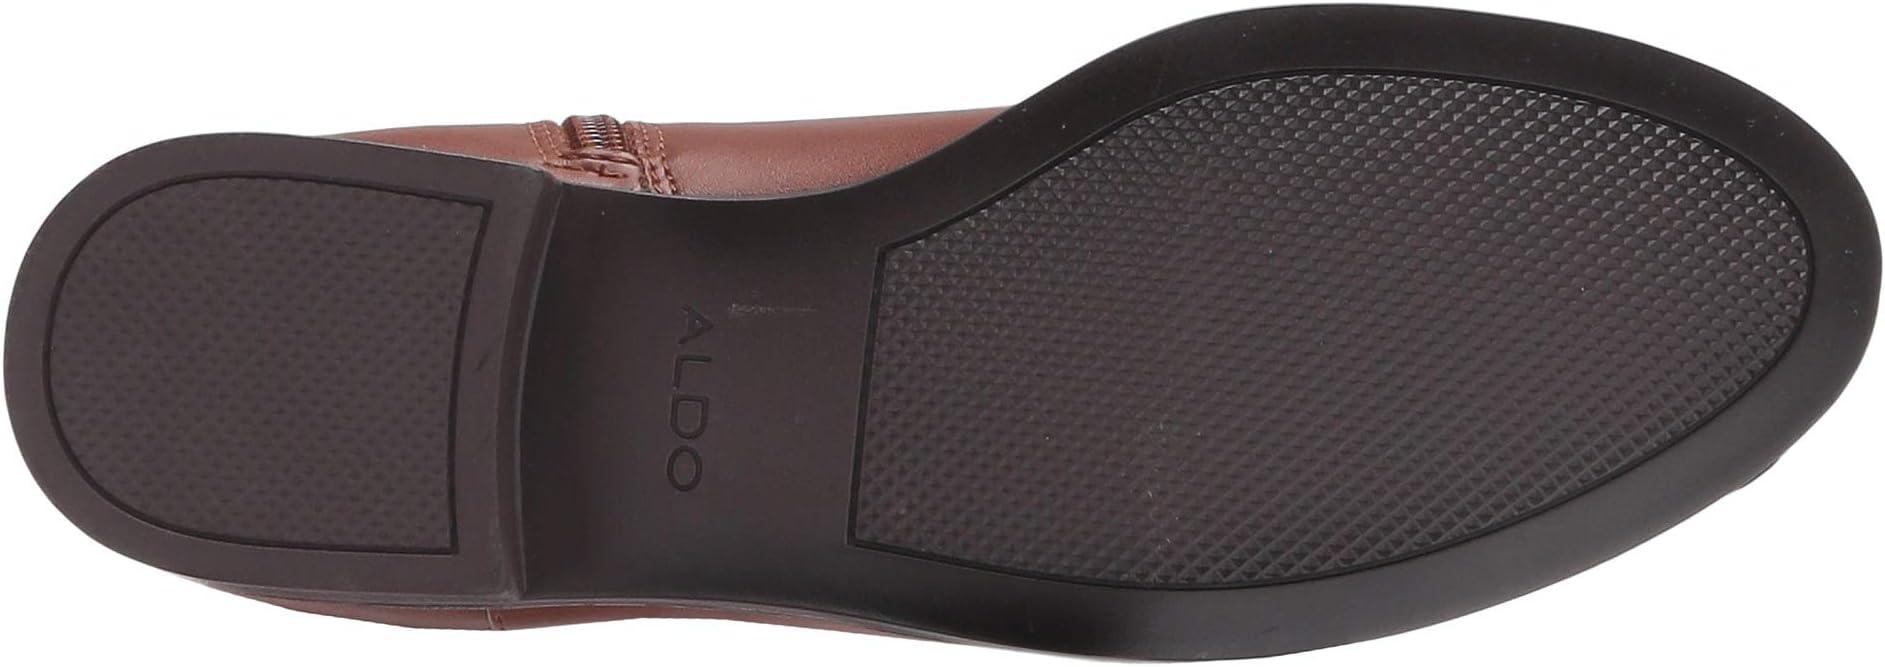 ALDO Hoiclya | Women's shoes | 2020 Newest